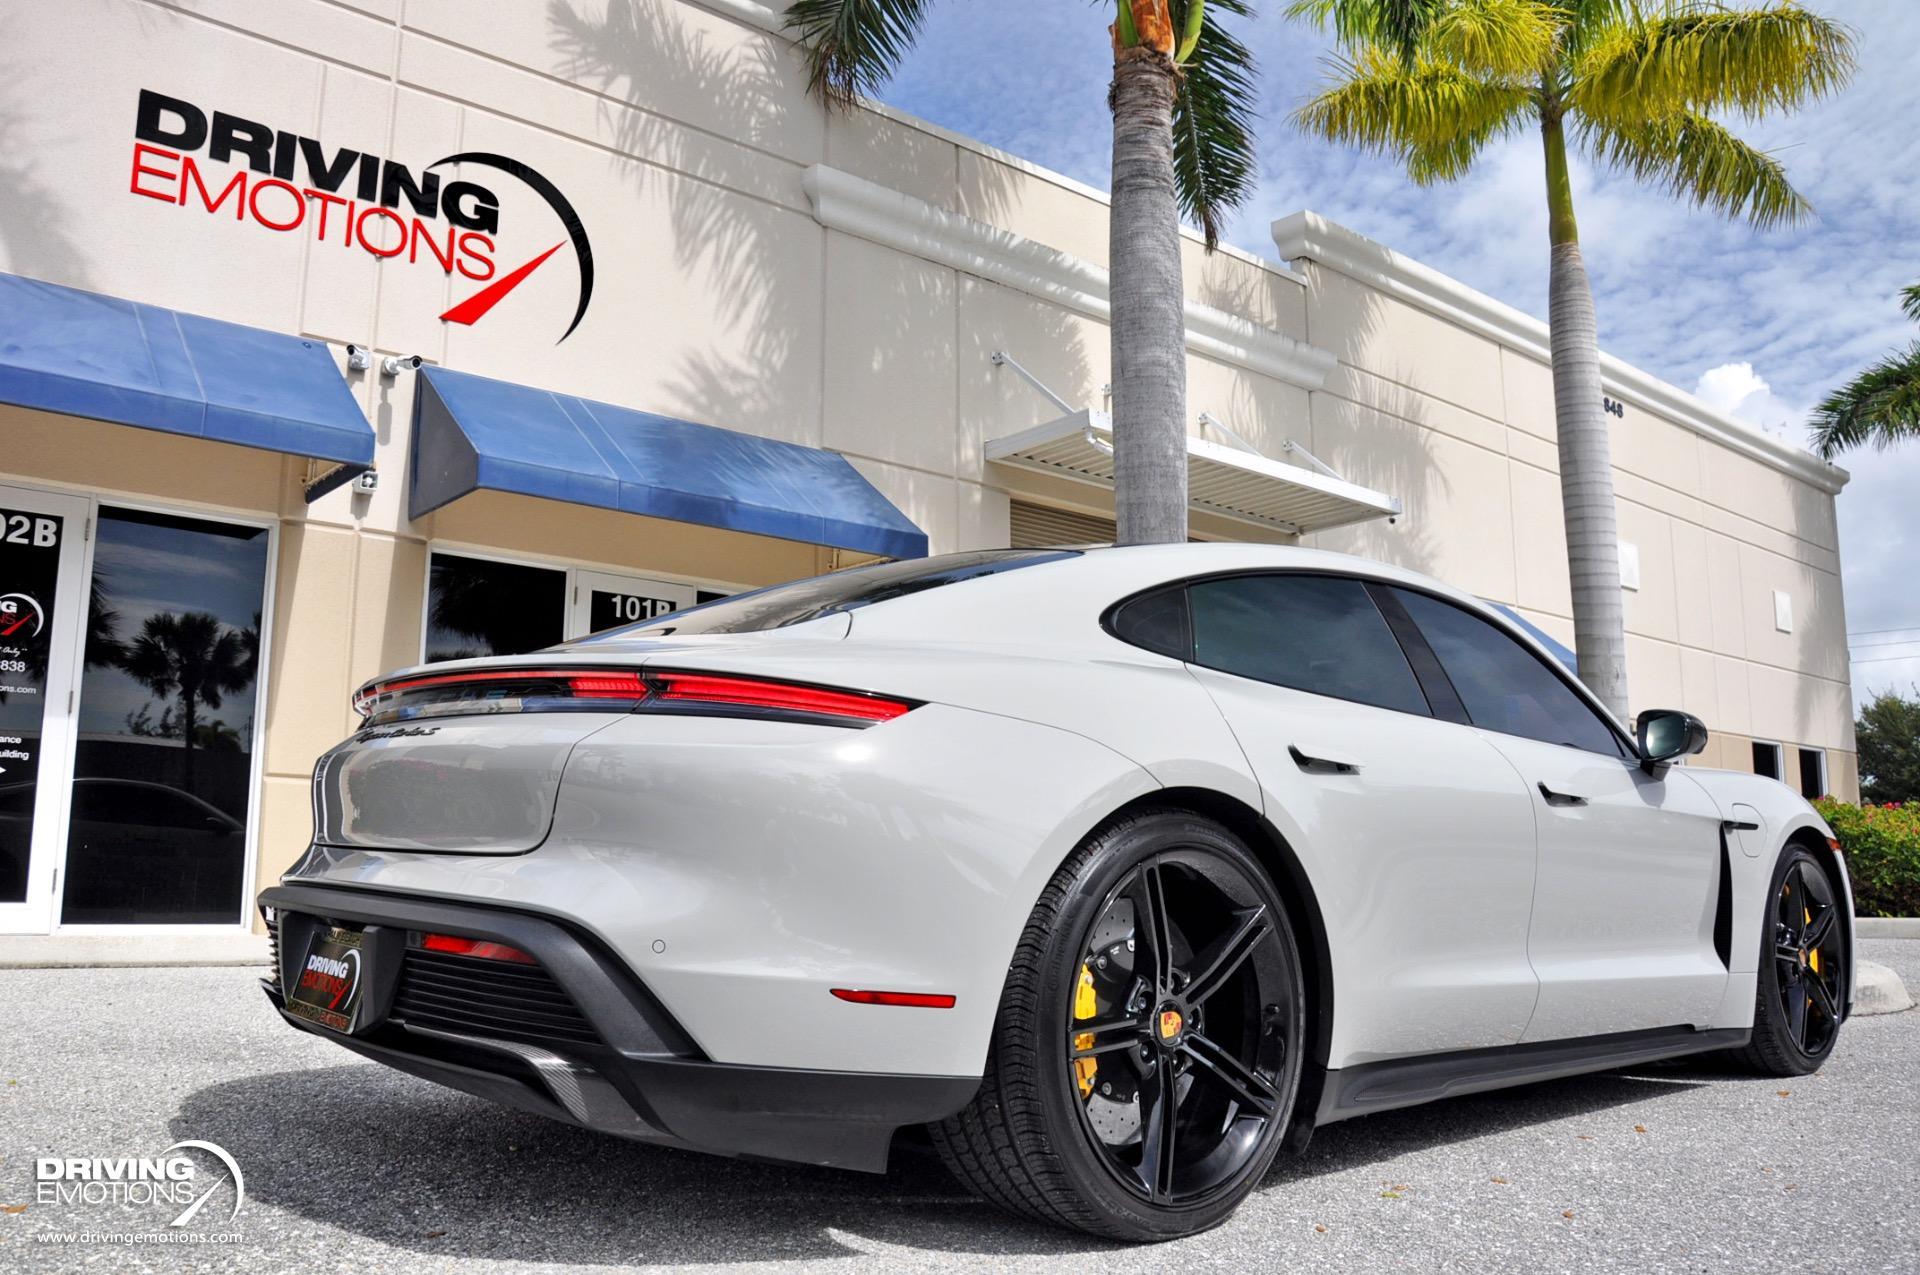 Used 2021 Porsche Taycan Turbo S Turbo S Chalk/Black! Premium Pkg! Passenger Display! | Lake Park, FL